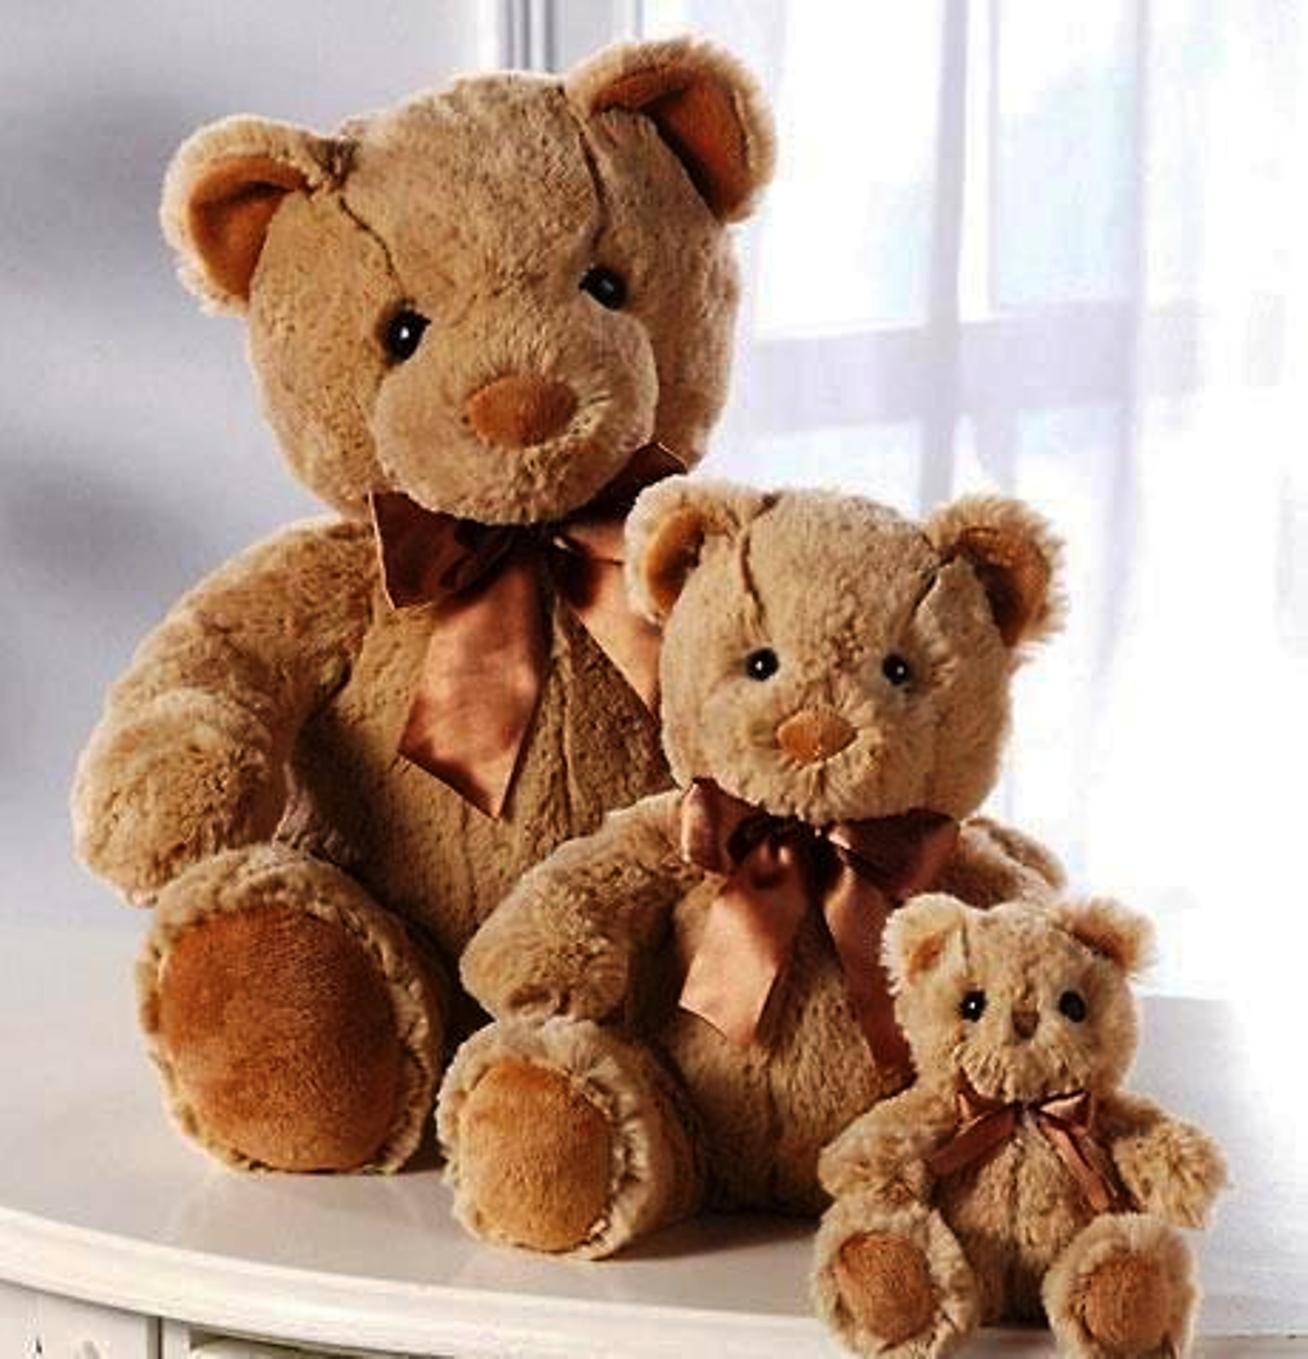 3 SOFT PLUSH TEDDY BEAR FAMILY COLLECTION SET OF THREE ~ 4-1/2  + 8-1/2  + 12